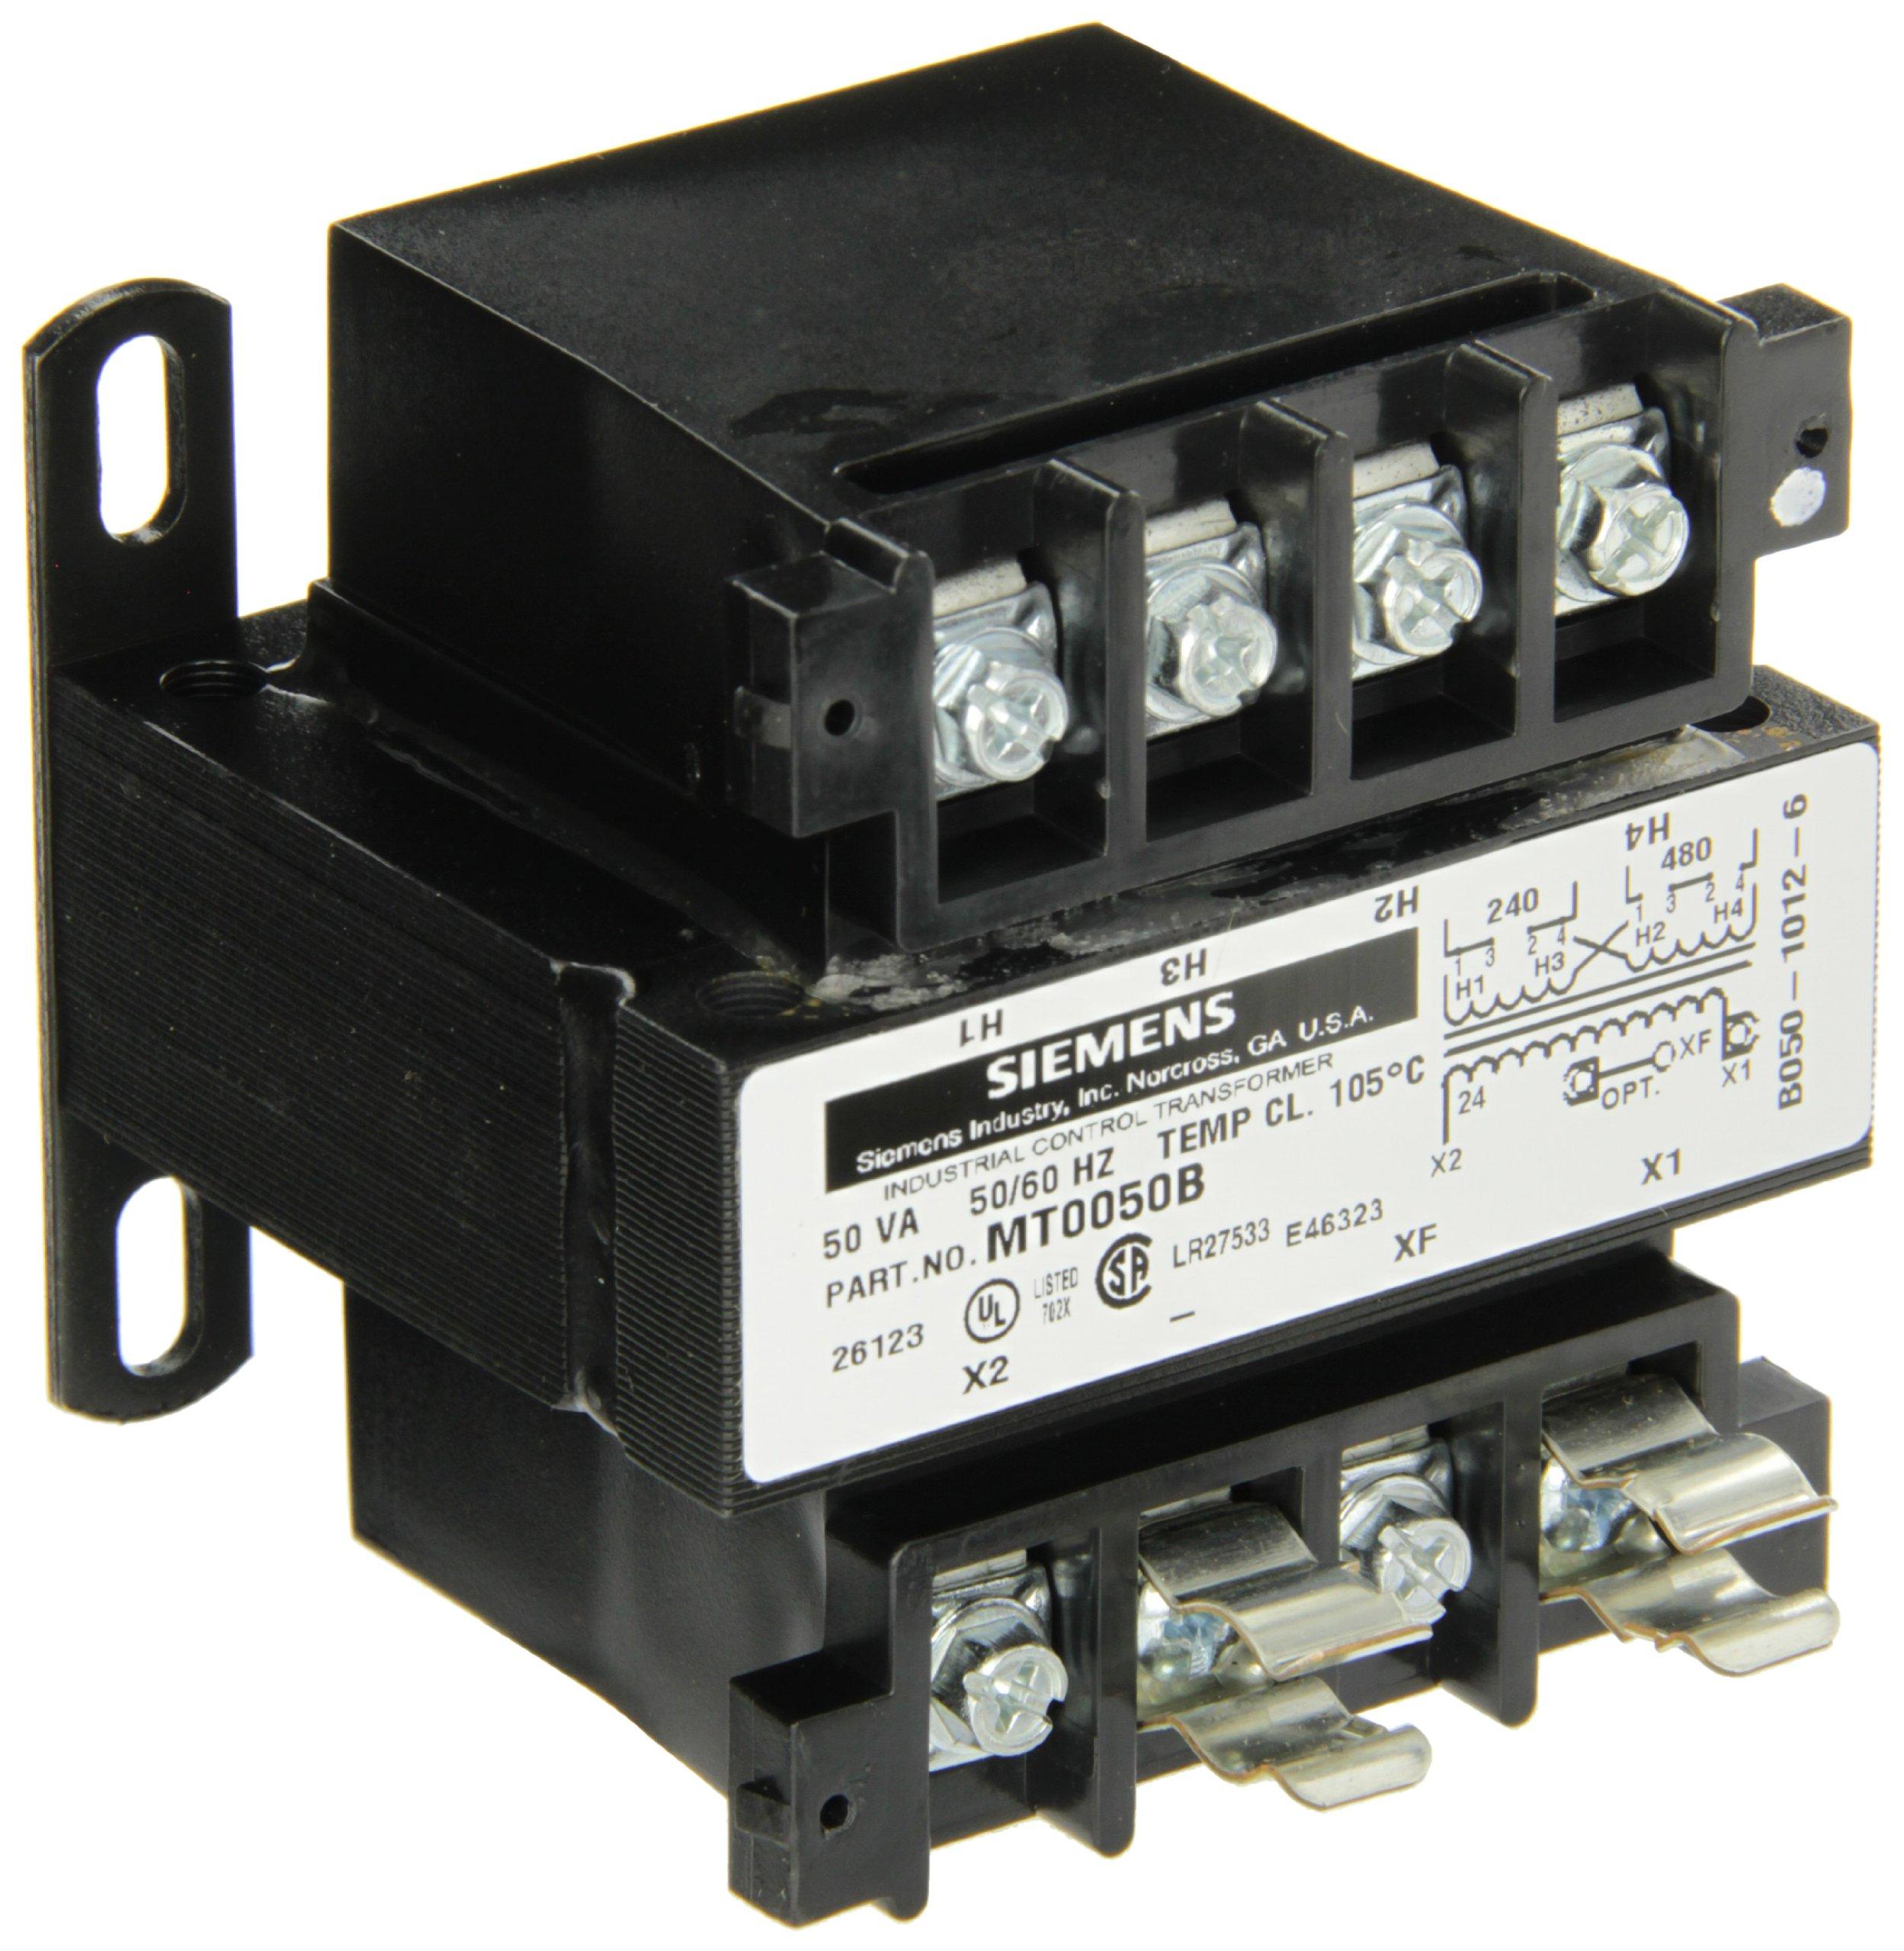 Siemens MT0050B Industrial Power Transformer, Domestic, 240 X 480 Primary Volts 50/60Hz, 24 Secondary Volts, 50VA Rating